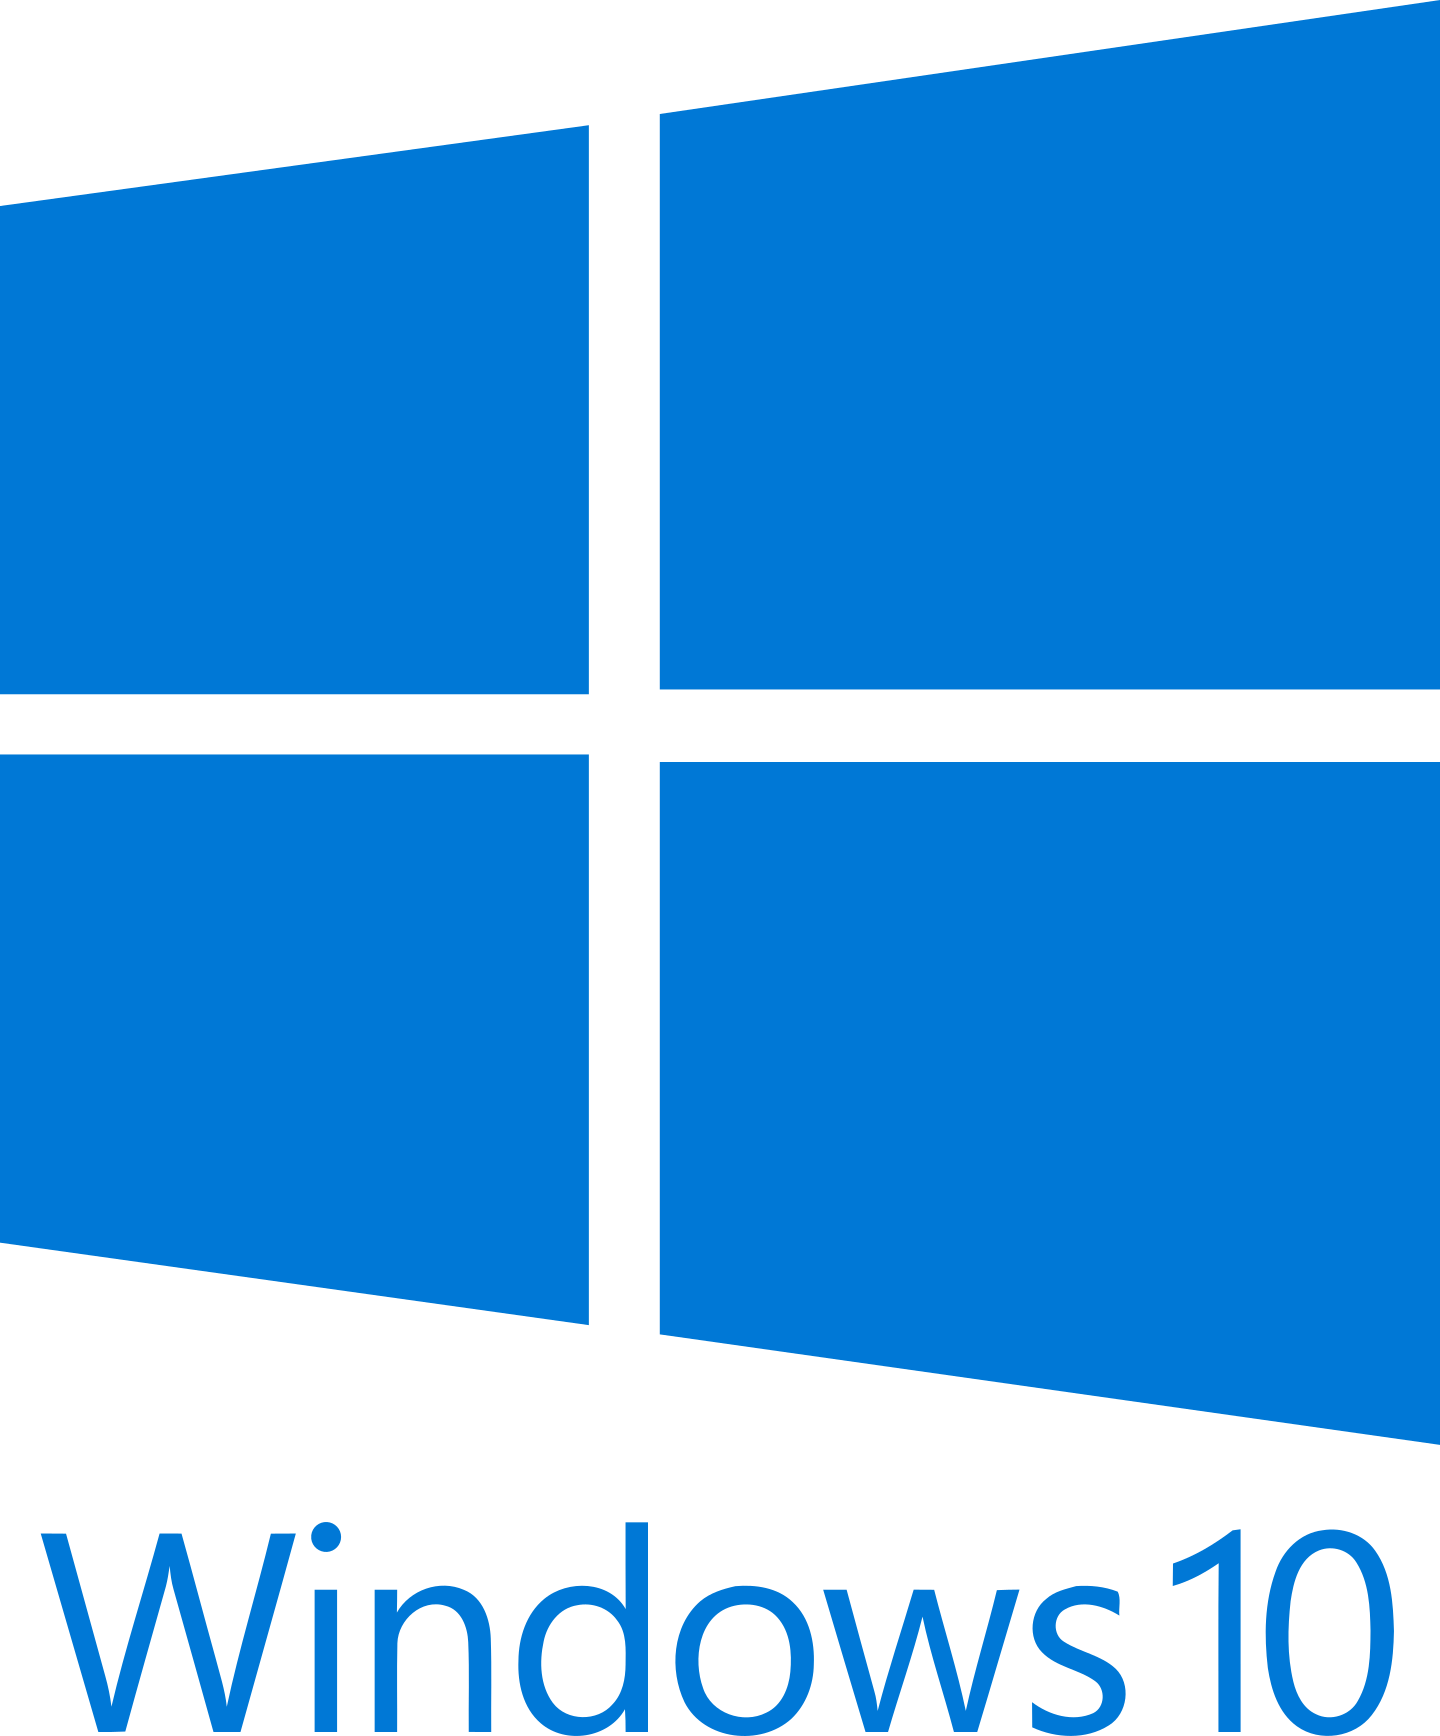 windows 10 logo 4 - Windows 10 Logo